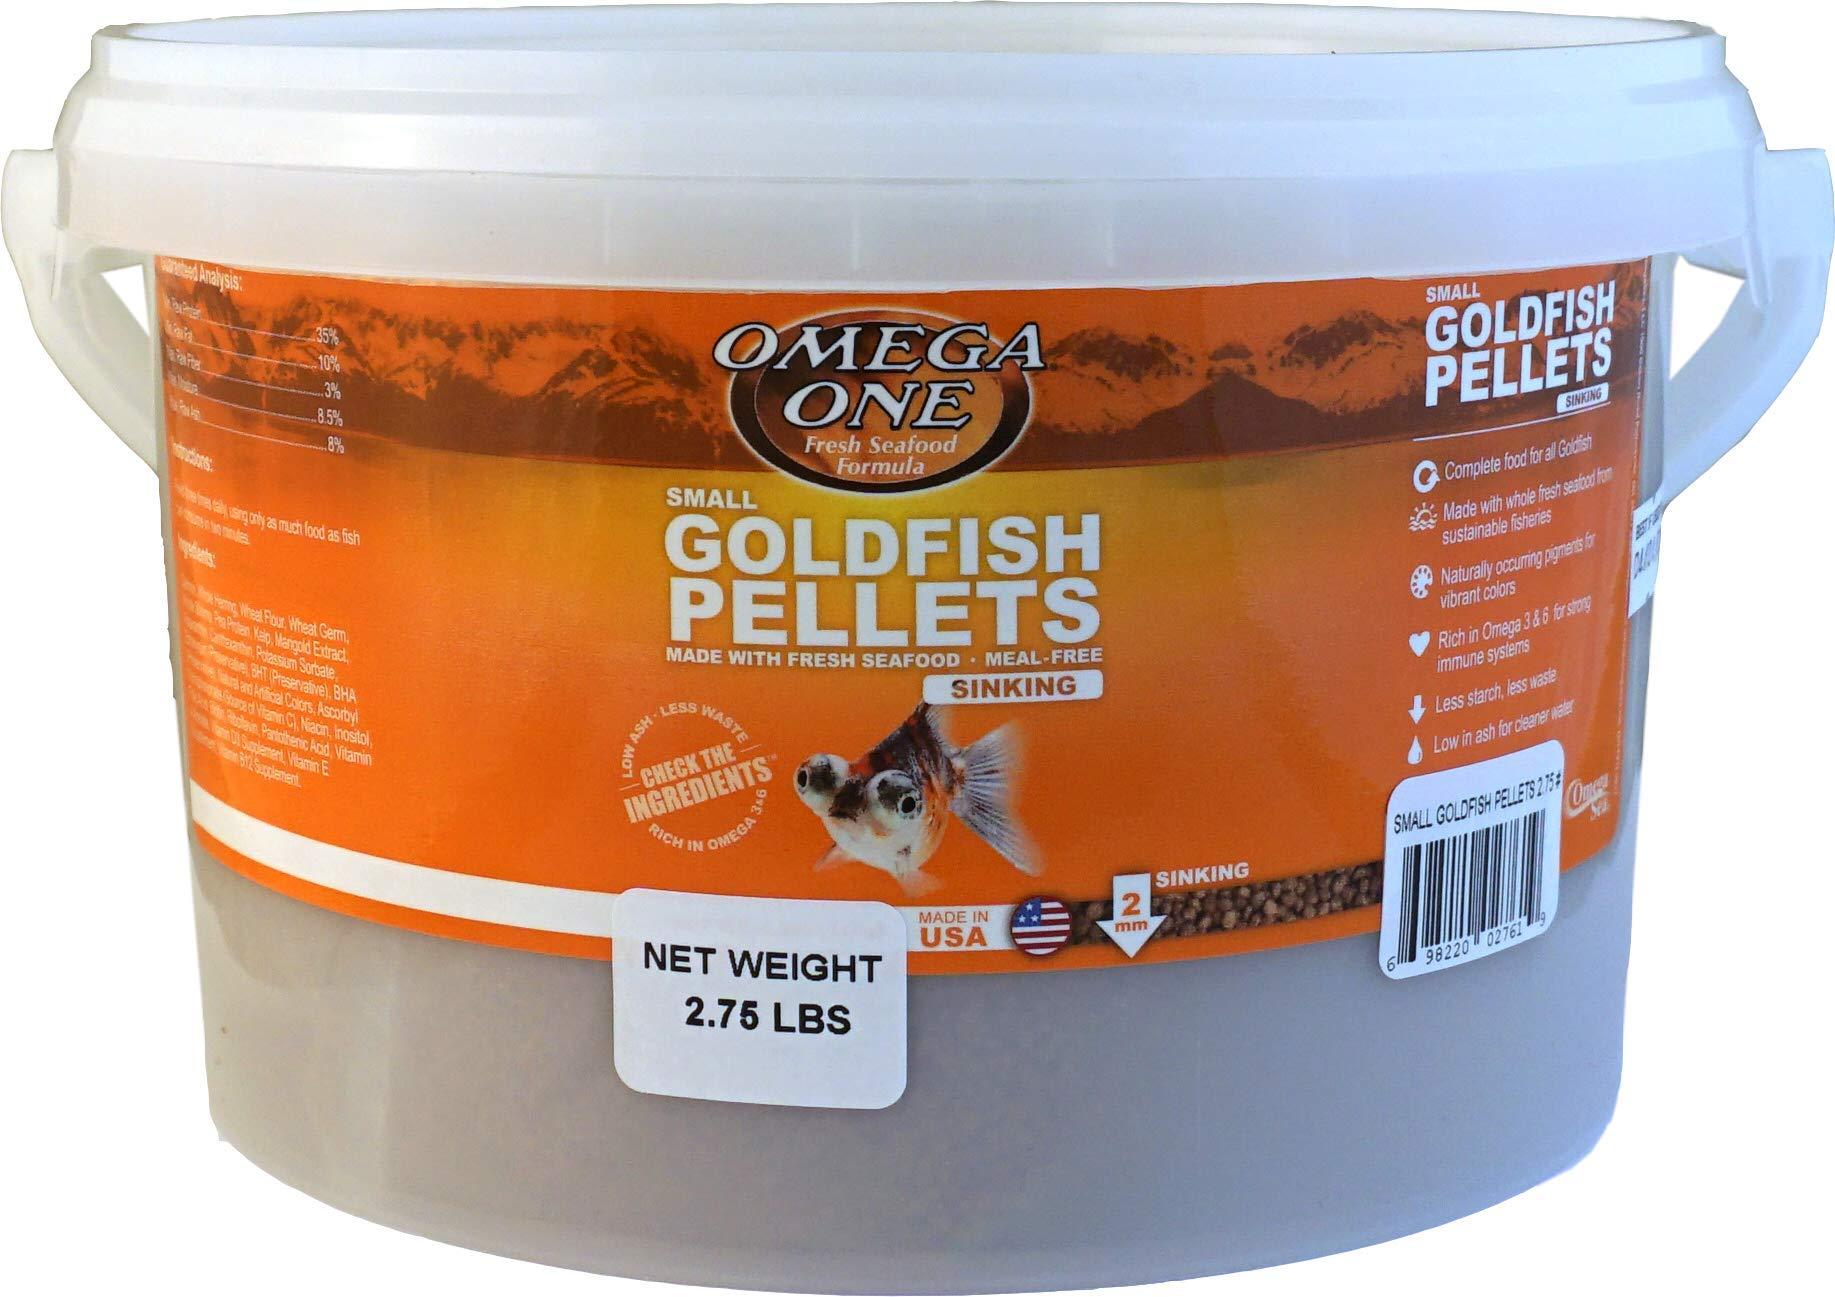 Omega One Small Sinking Goldfish Pellets Fish Food 2.75-Lbs.